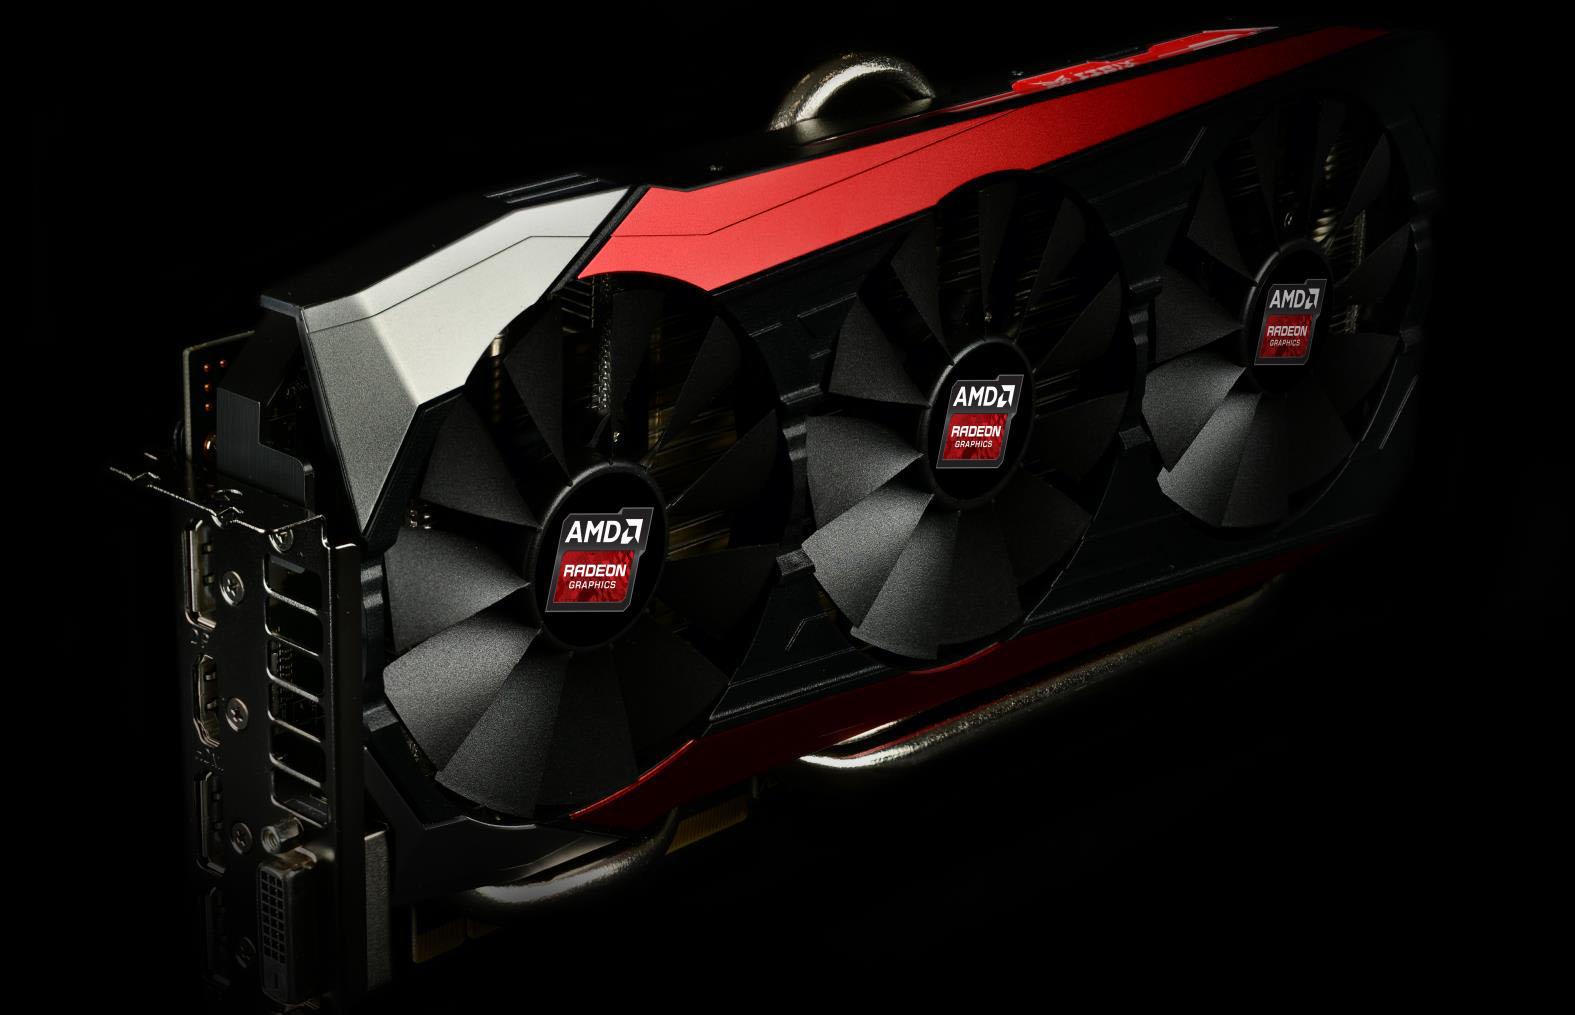 AMD Radeon R9 Fury Asus Strixx